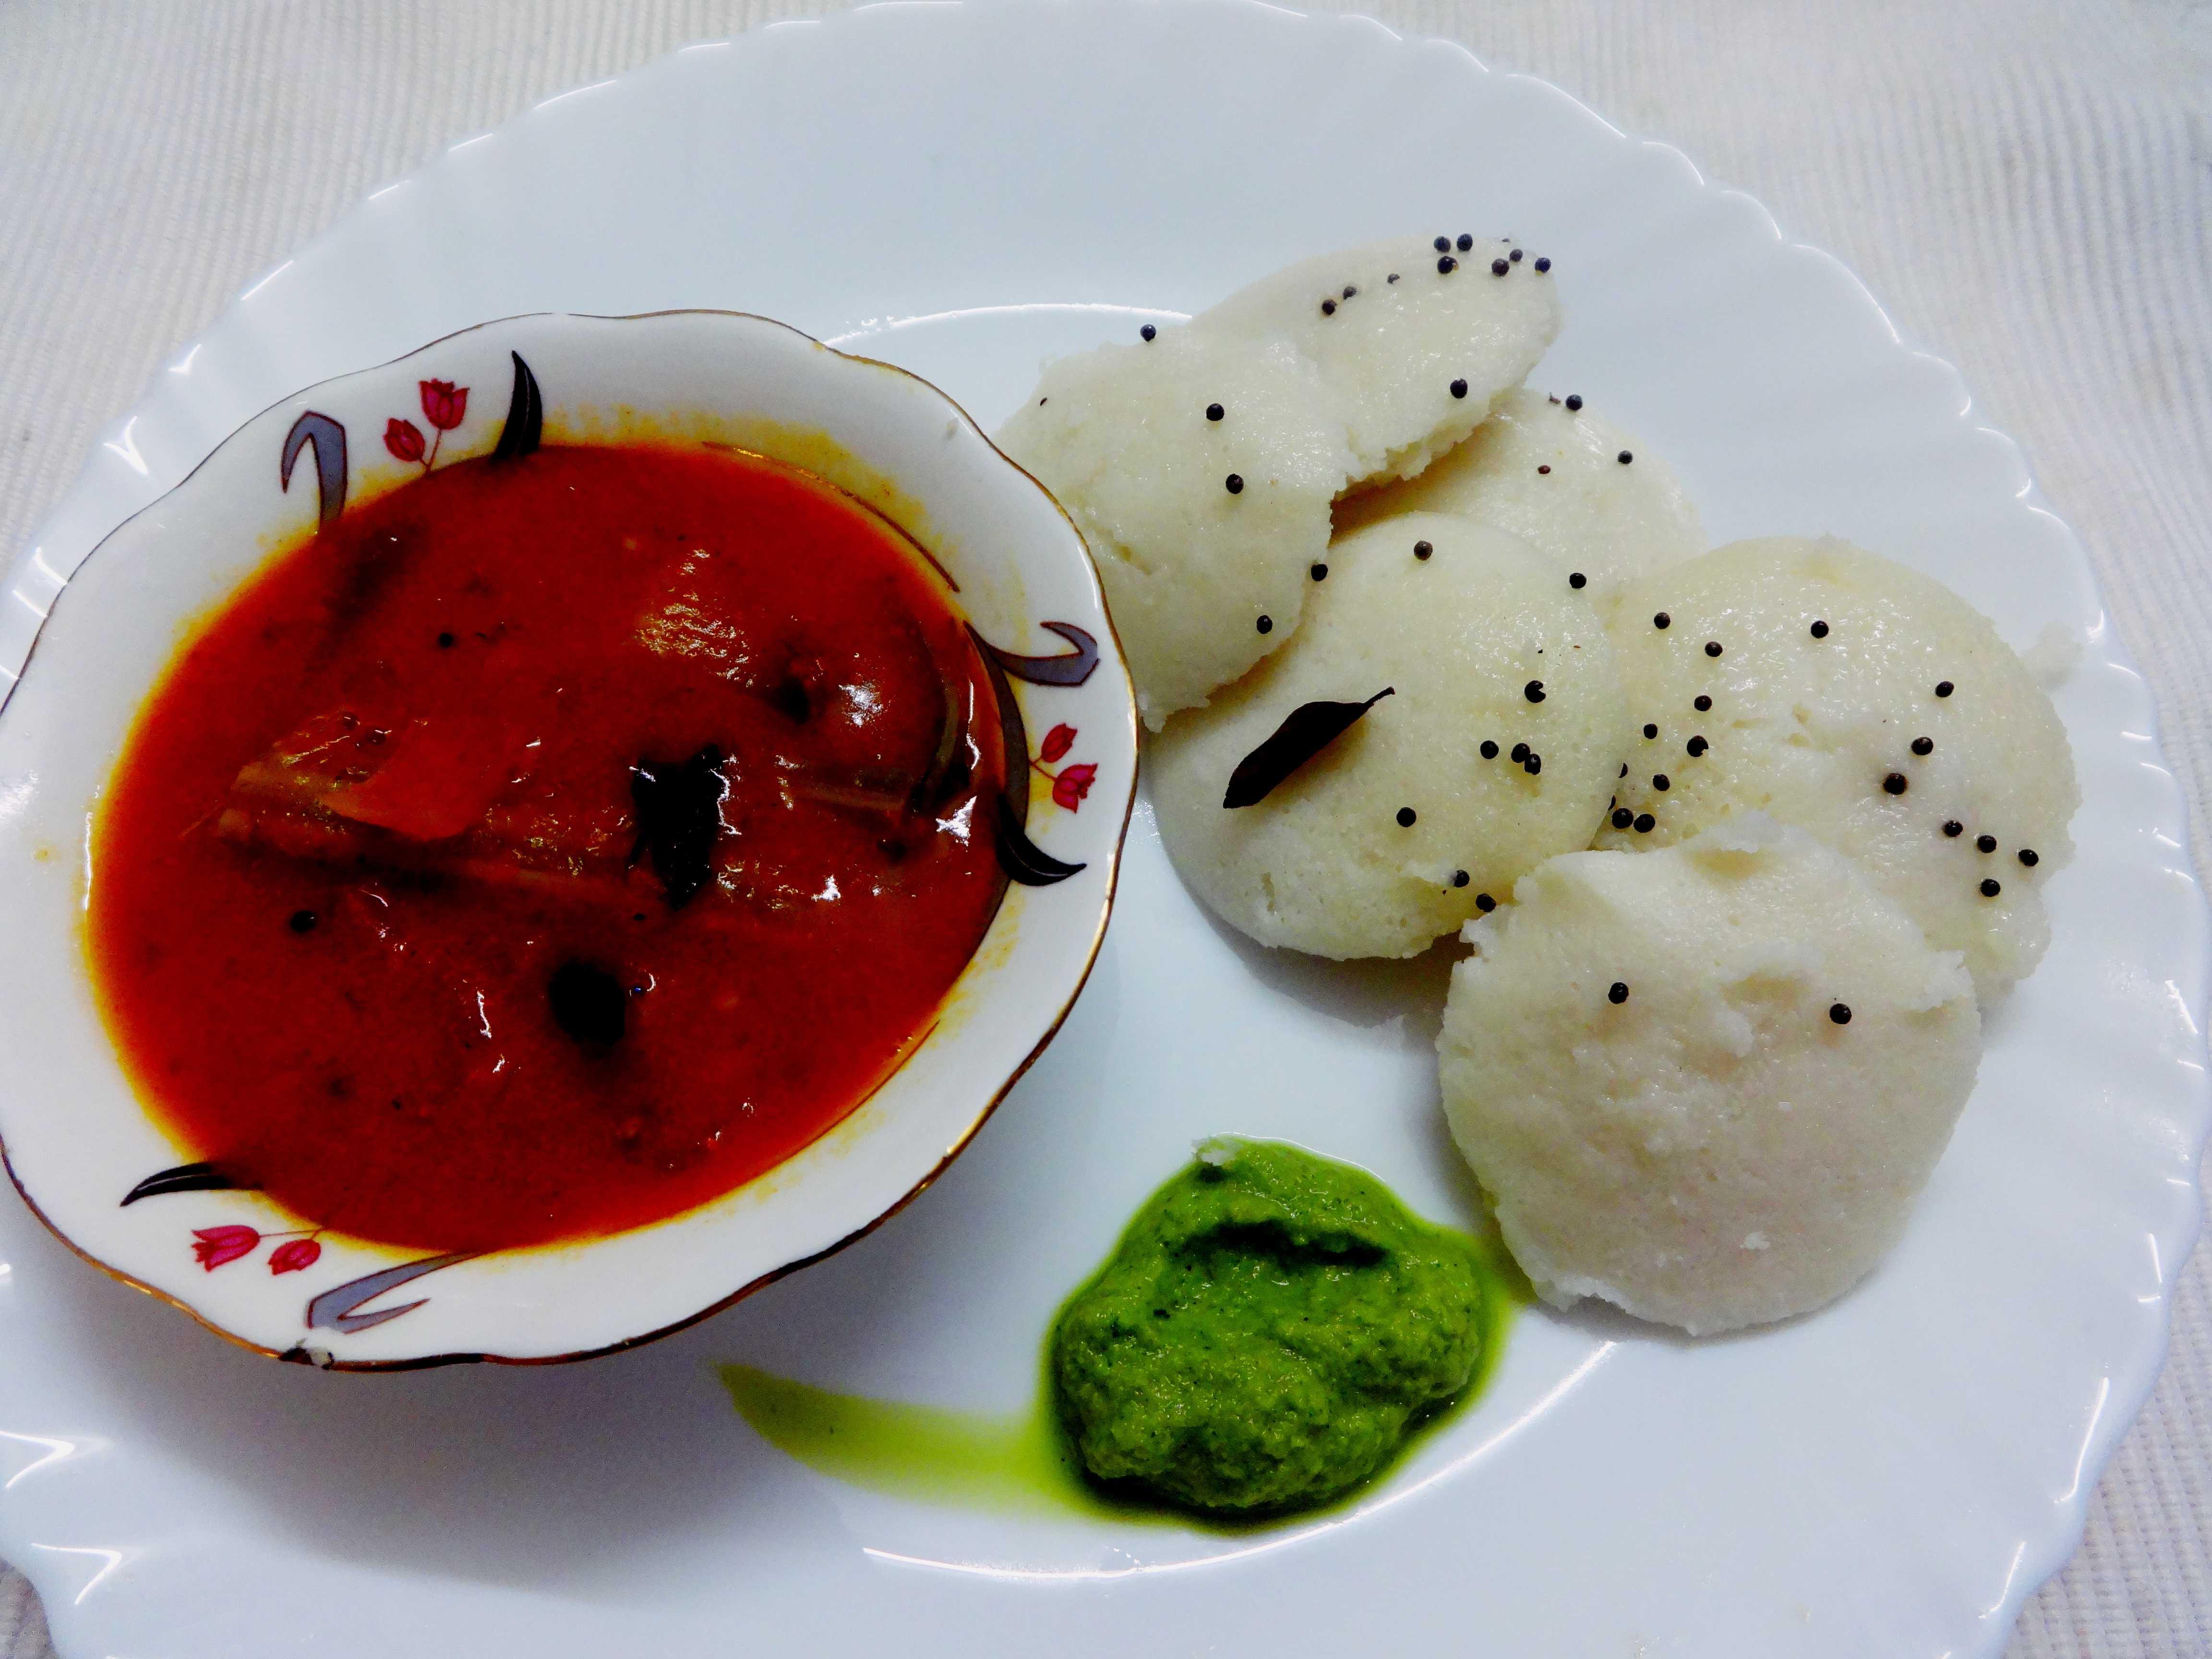 Idly sambar chutney